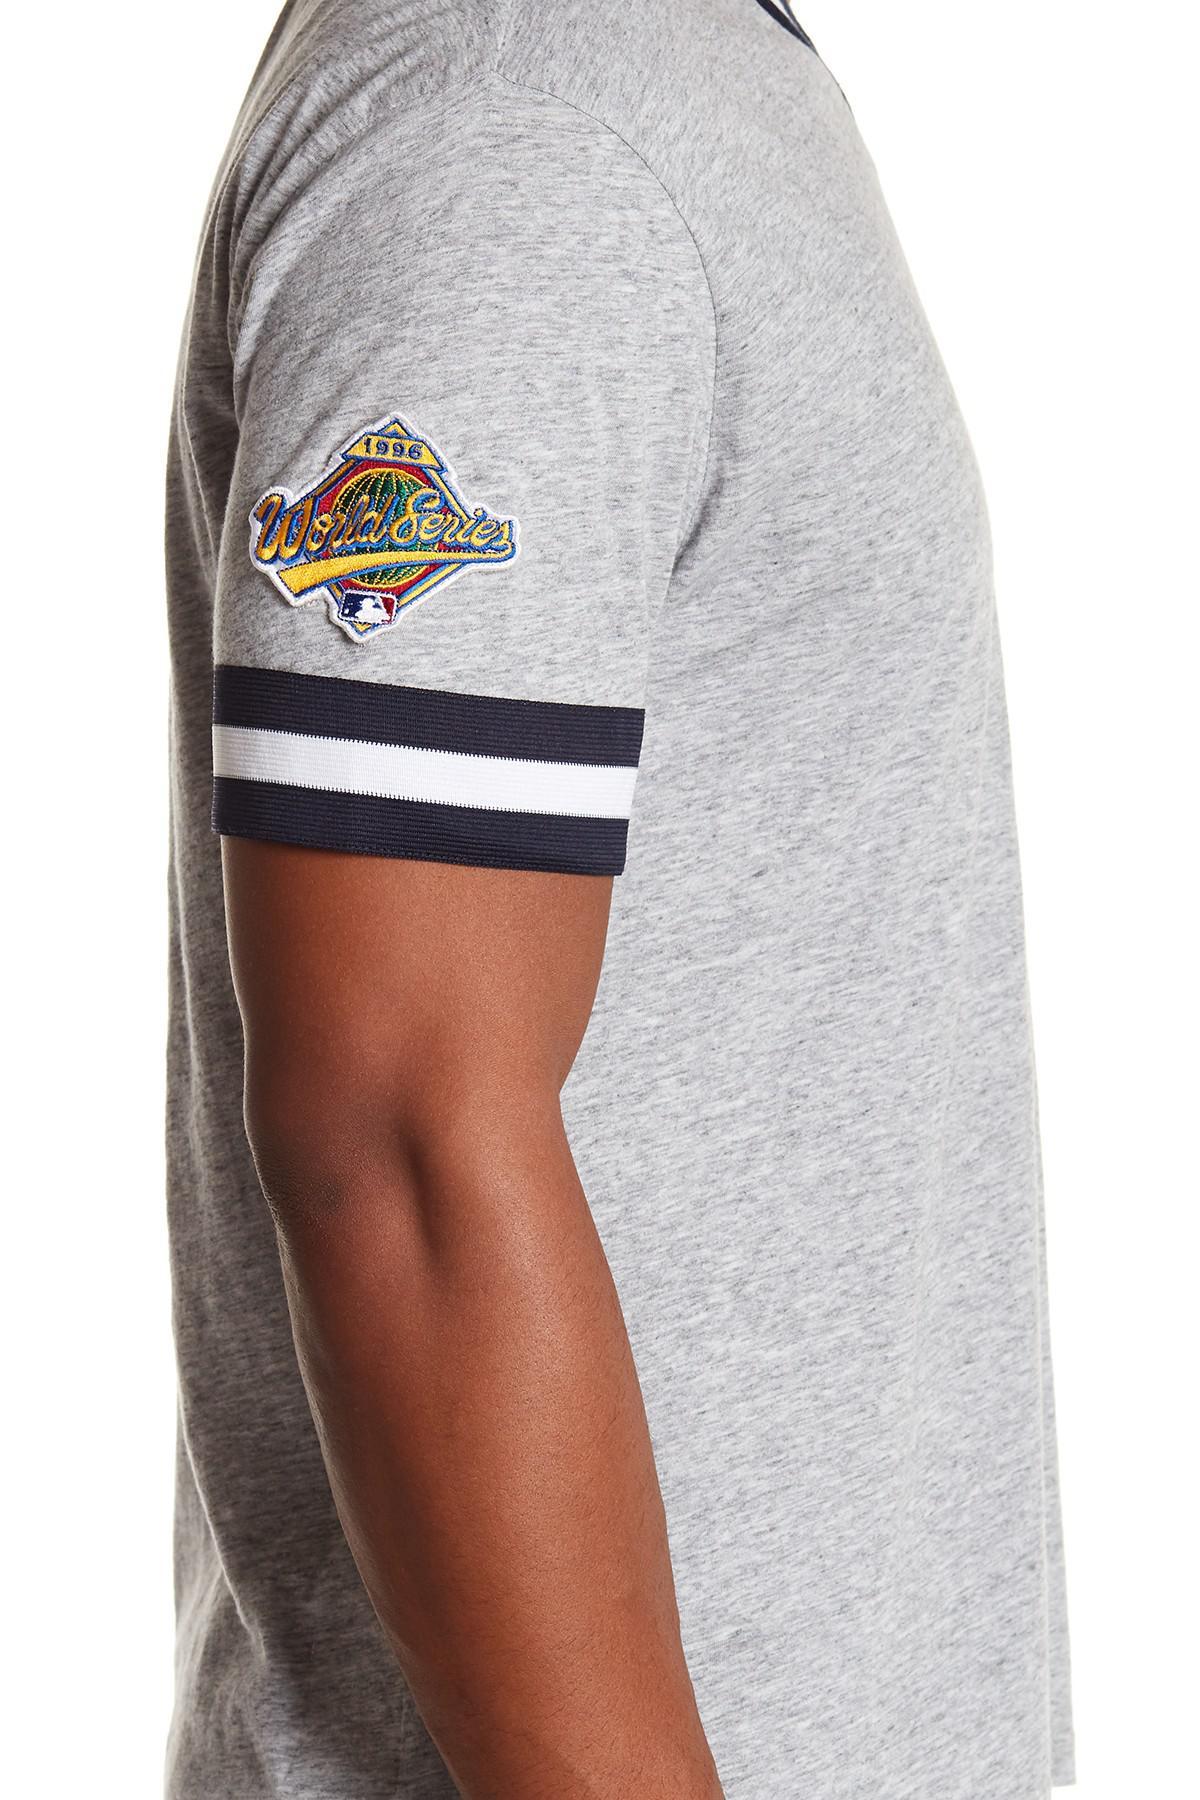 8af272677 New York Yankees T Shirts Vintage - Cotswold Hire